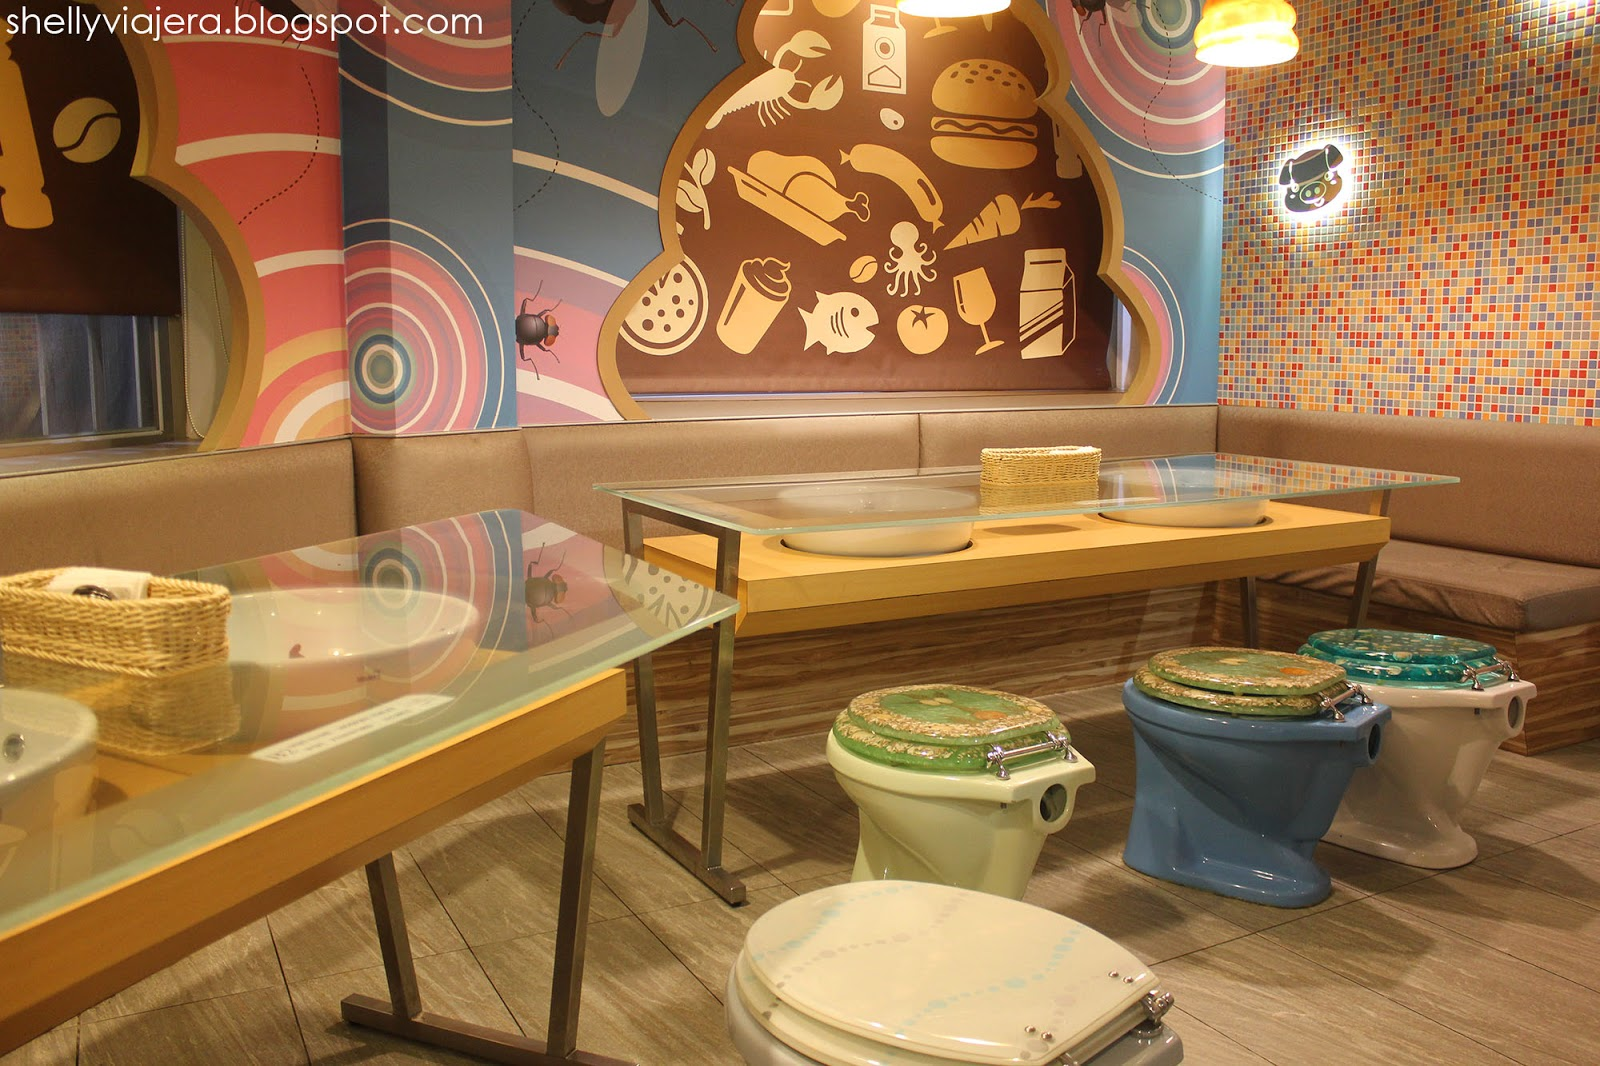 when in taiwan: modern toilet restaurant ~ shelly viajera travel blog